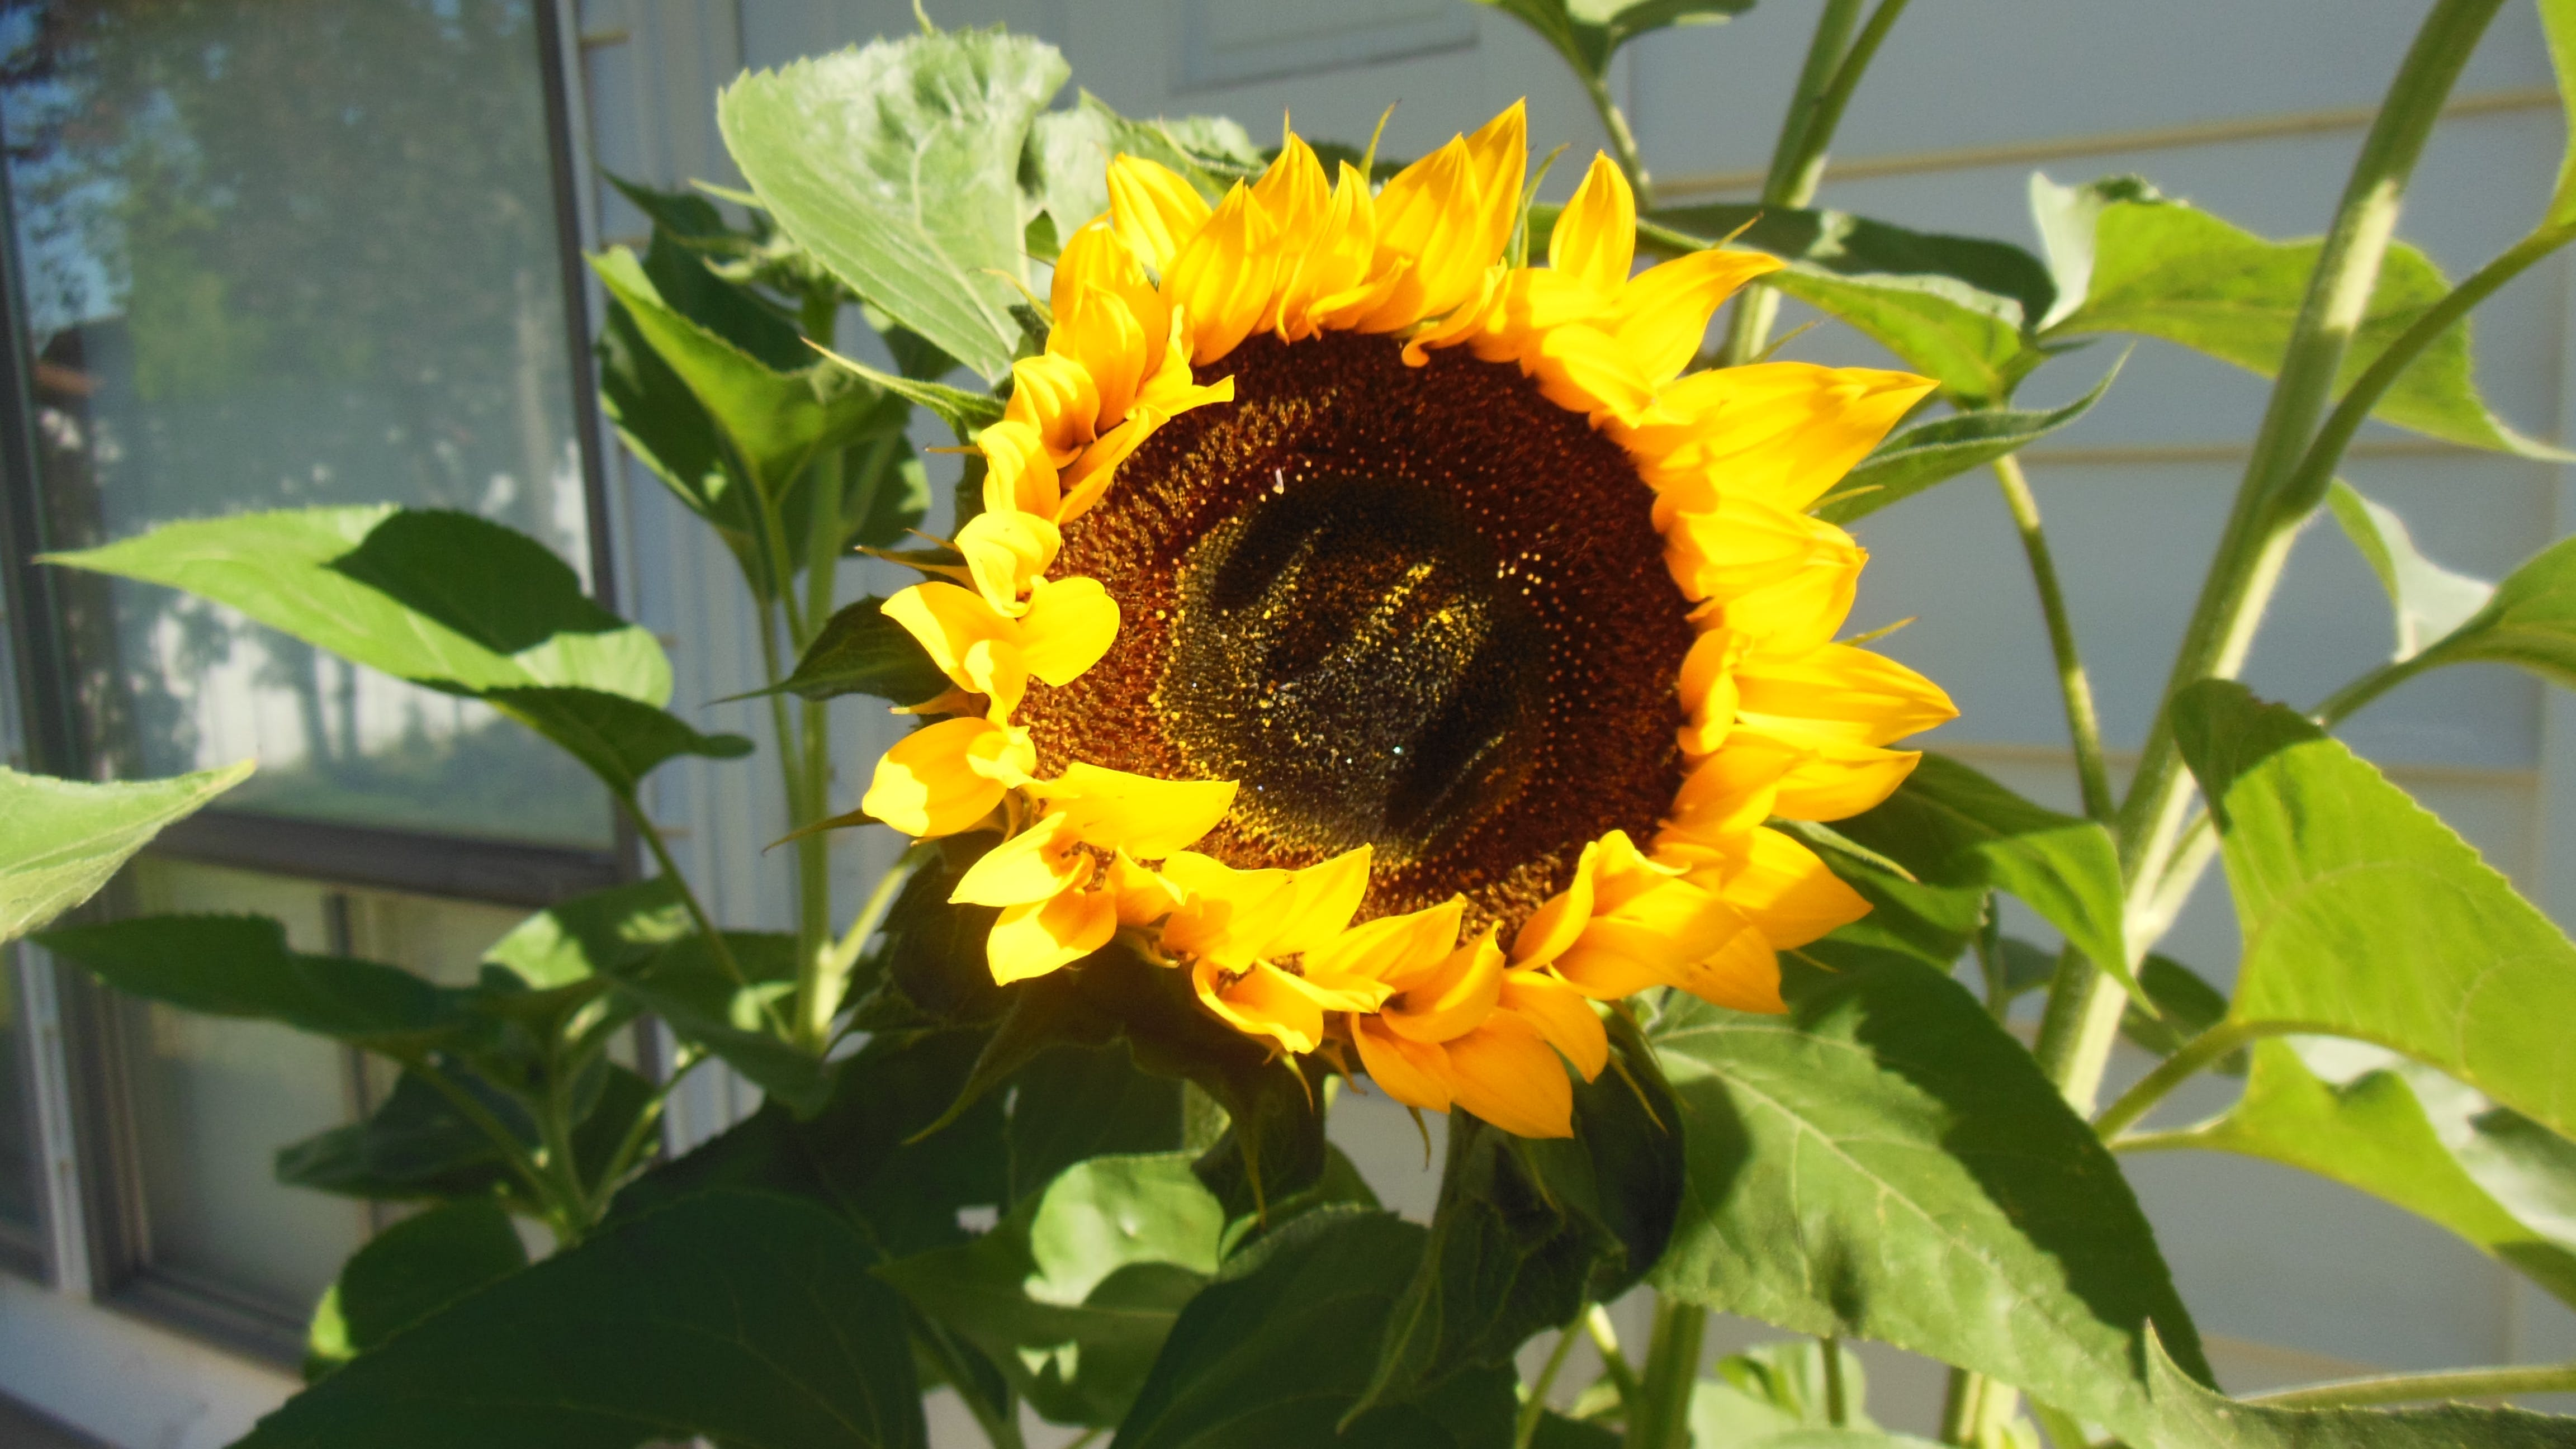 Free stock photo of sunflowers